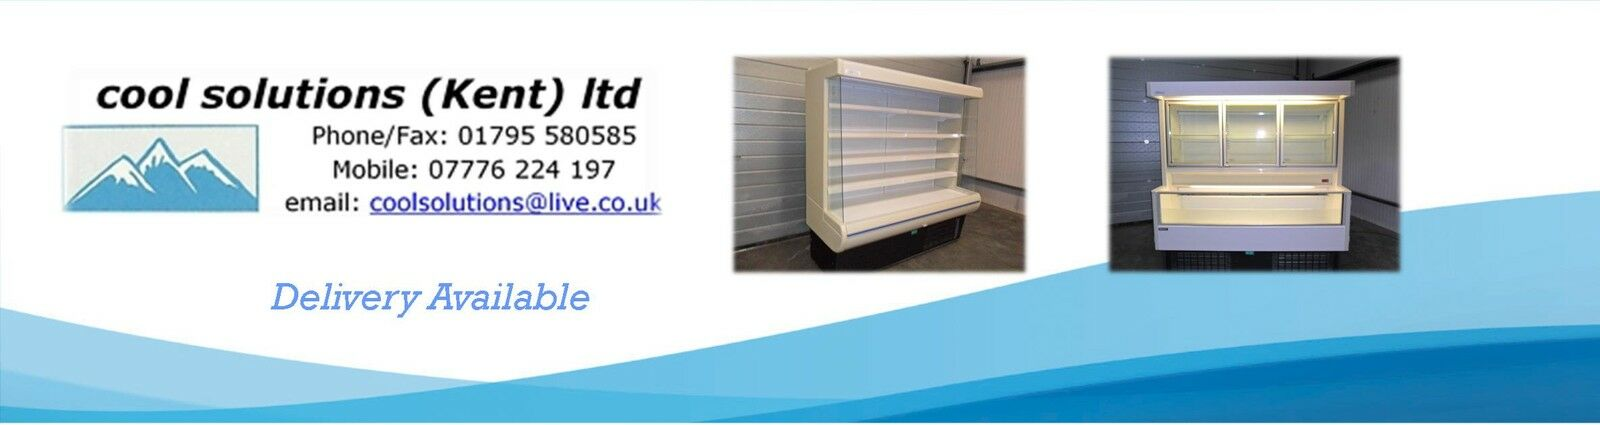 Cool Solutions Kent Ltd